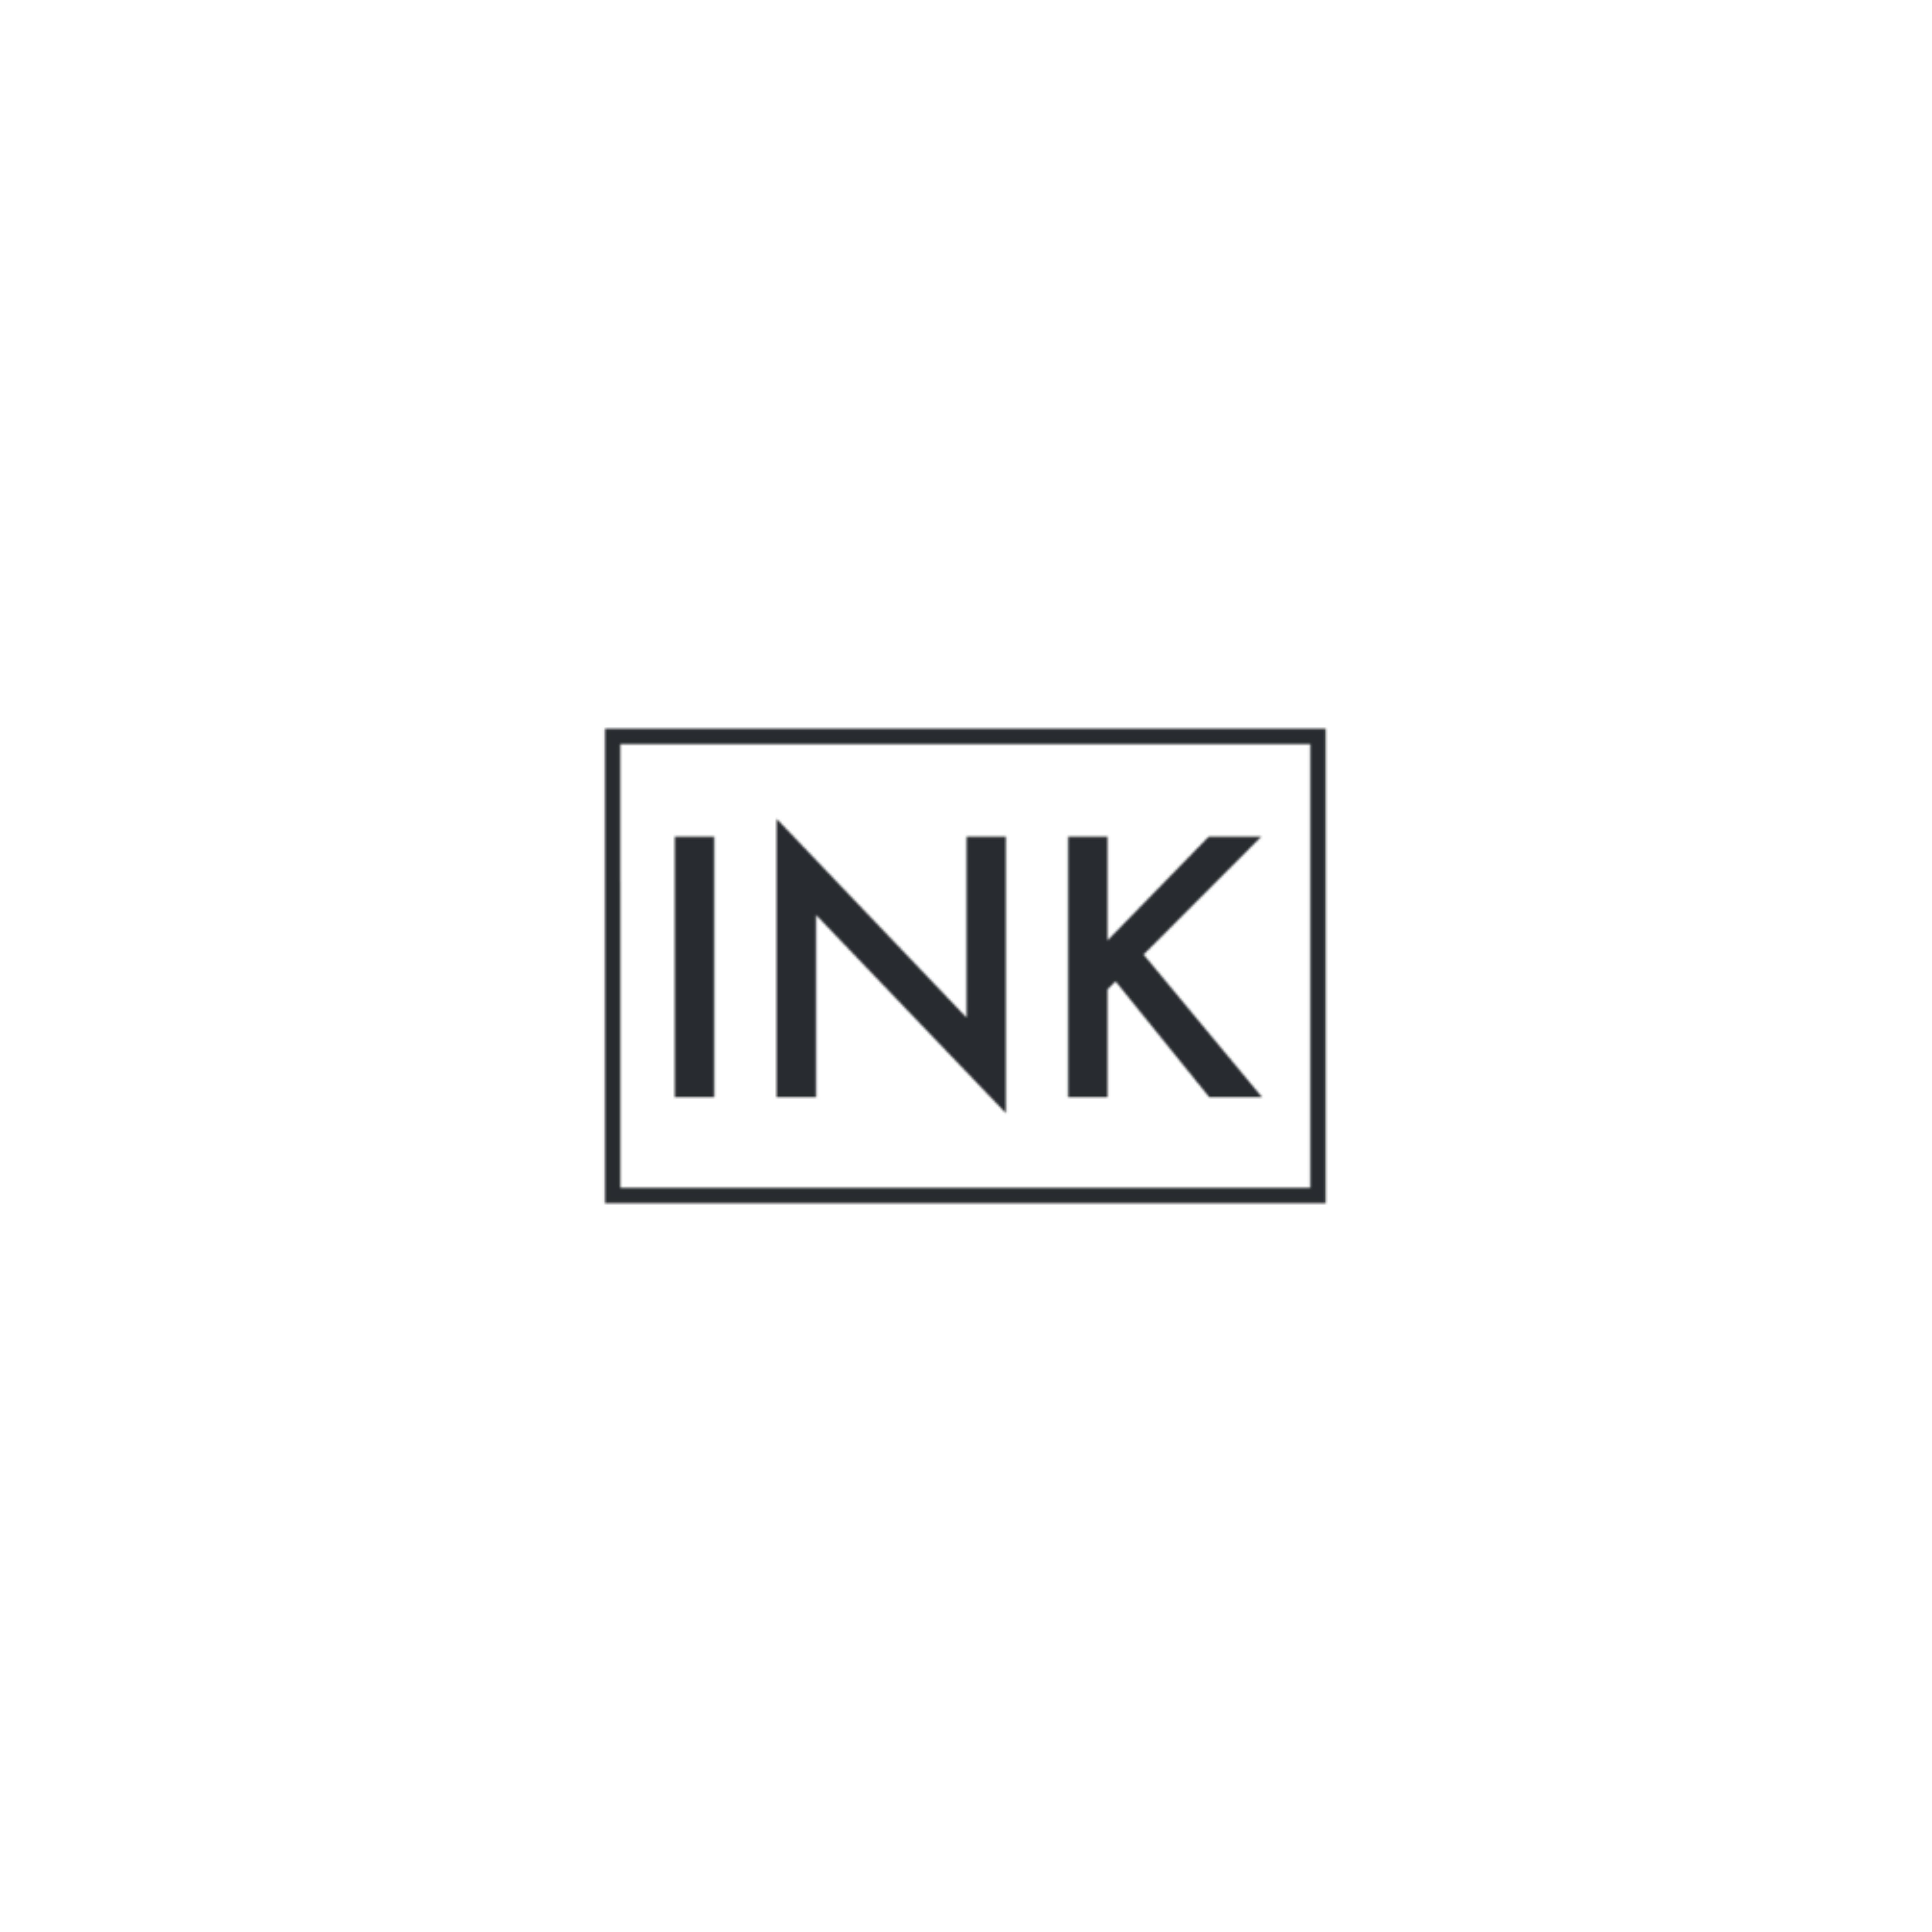 INK Creative